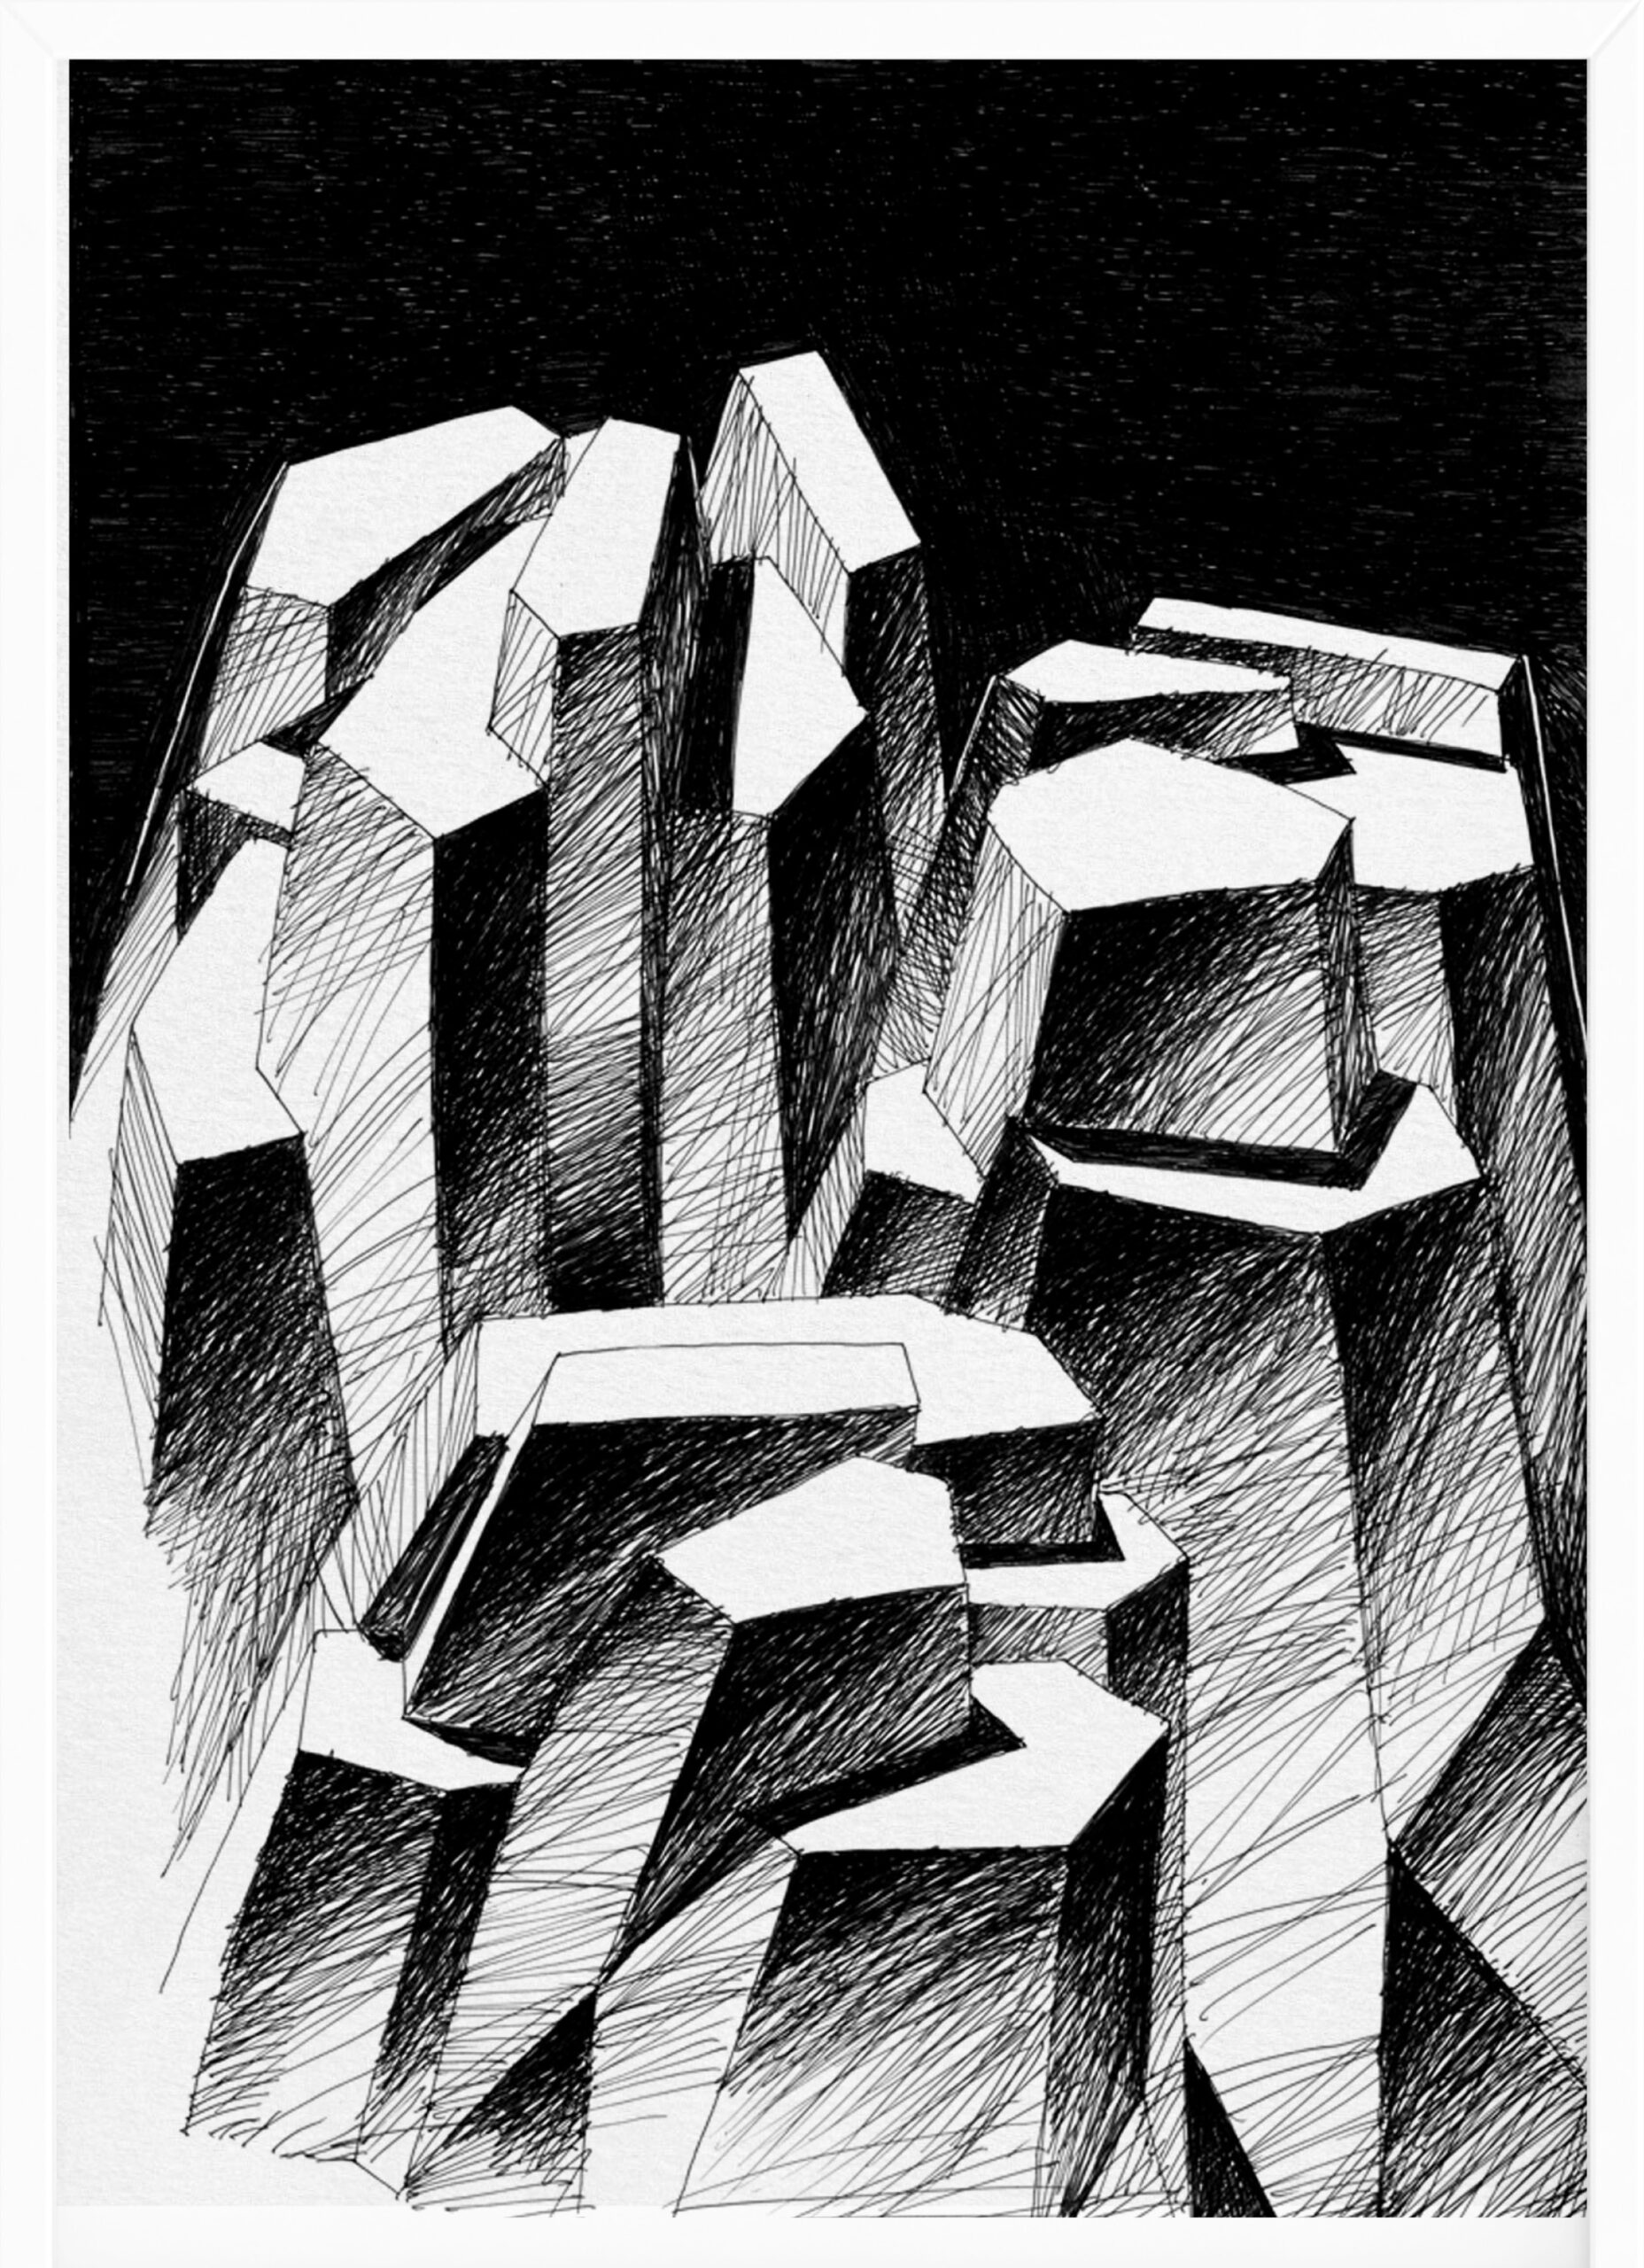 Neverland   Drawings   Mario Trimarchi design5